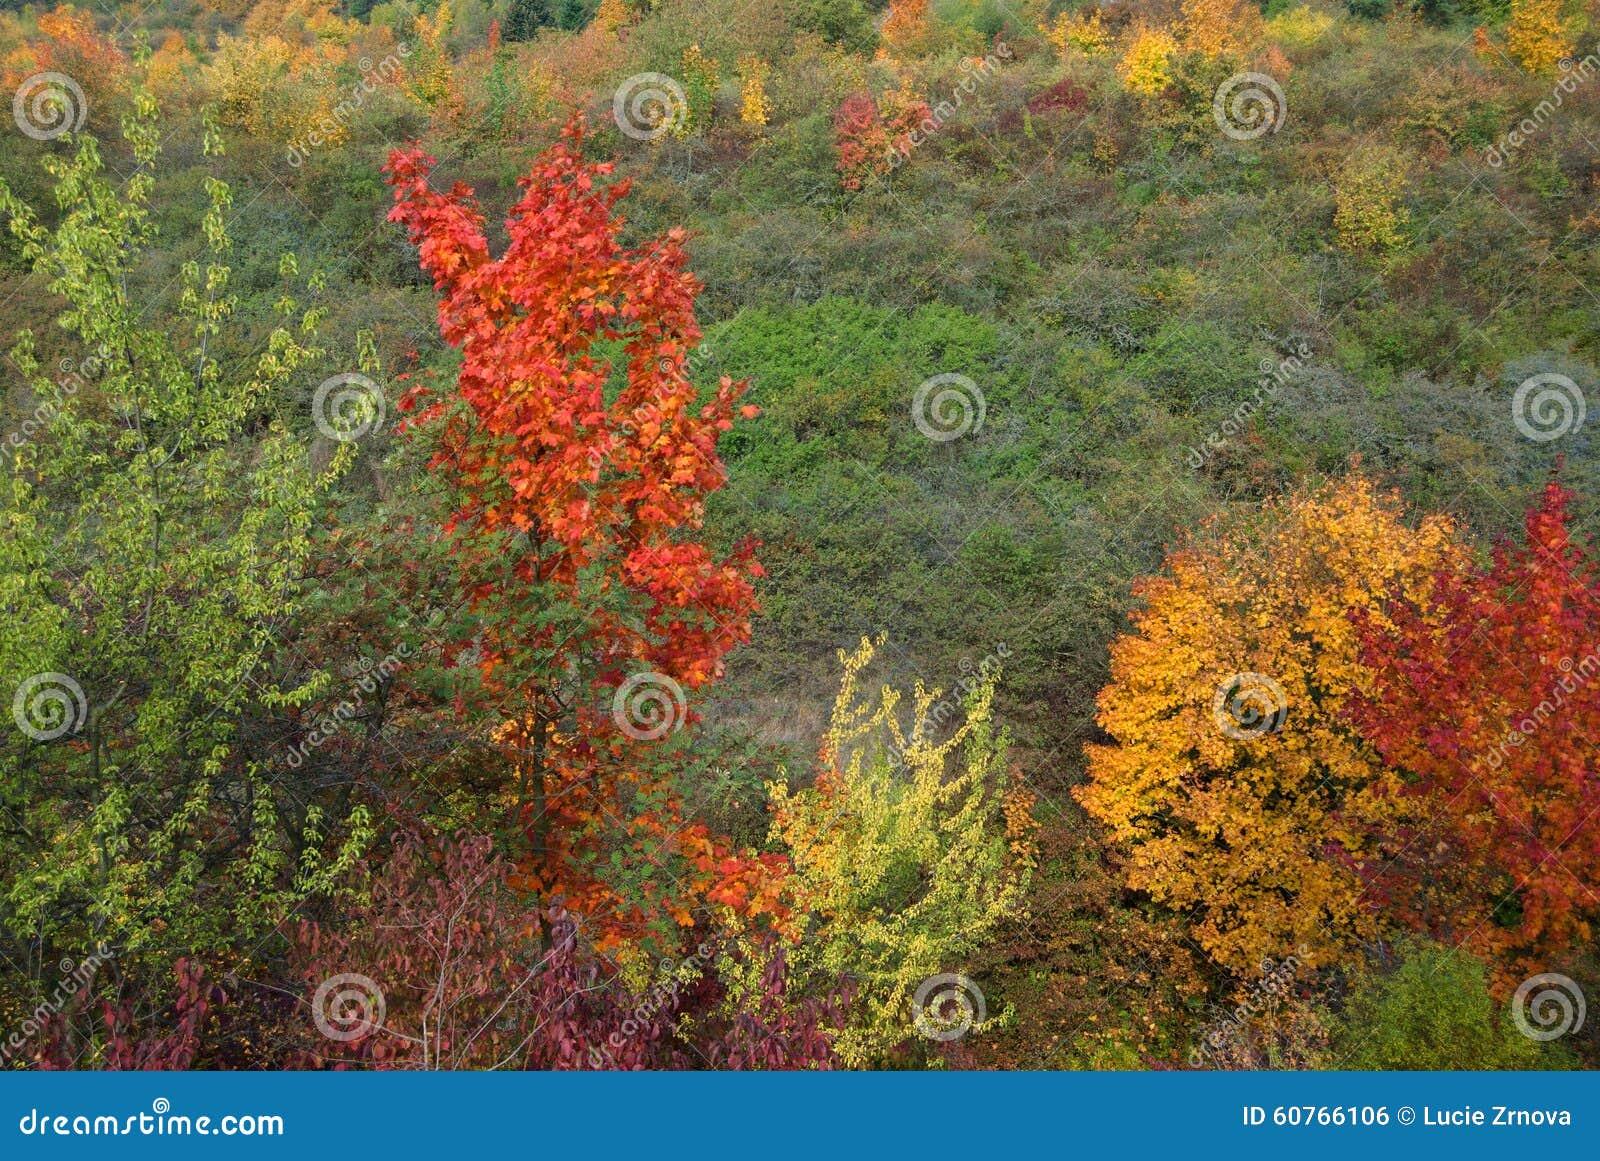 Autumn colorful trees